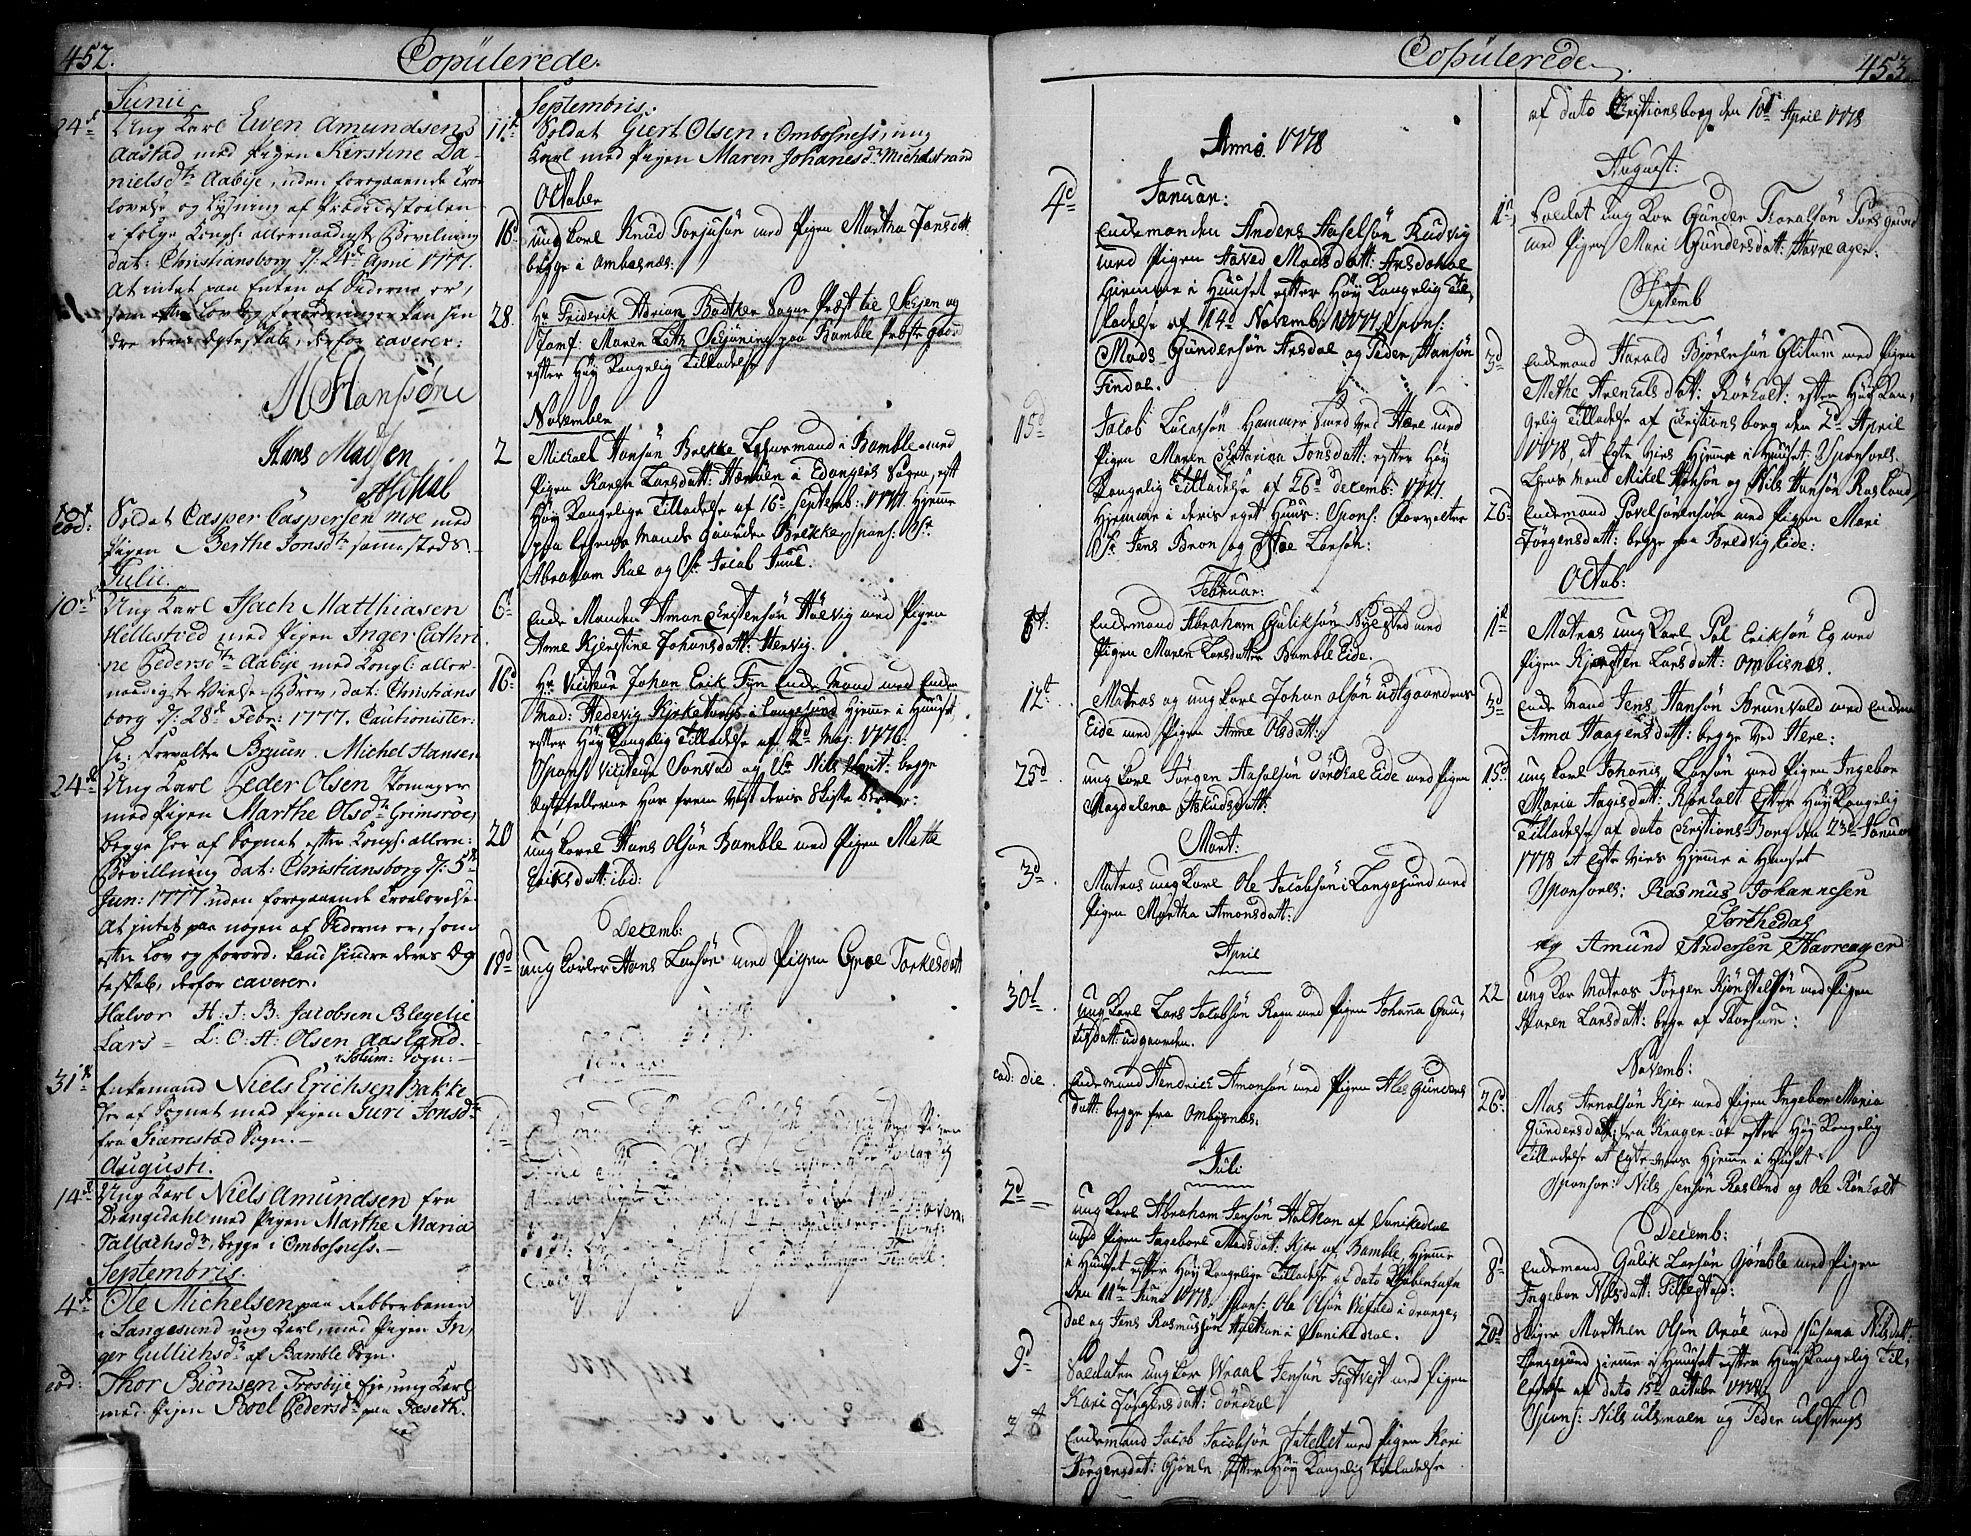 SAKO, Bamble kirkebøker, F/Fa/L0002: Ministerialbok nr. I 2, 1775-1814, s. 452-453